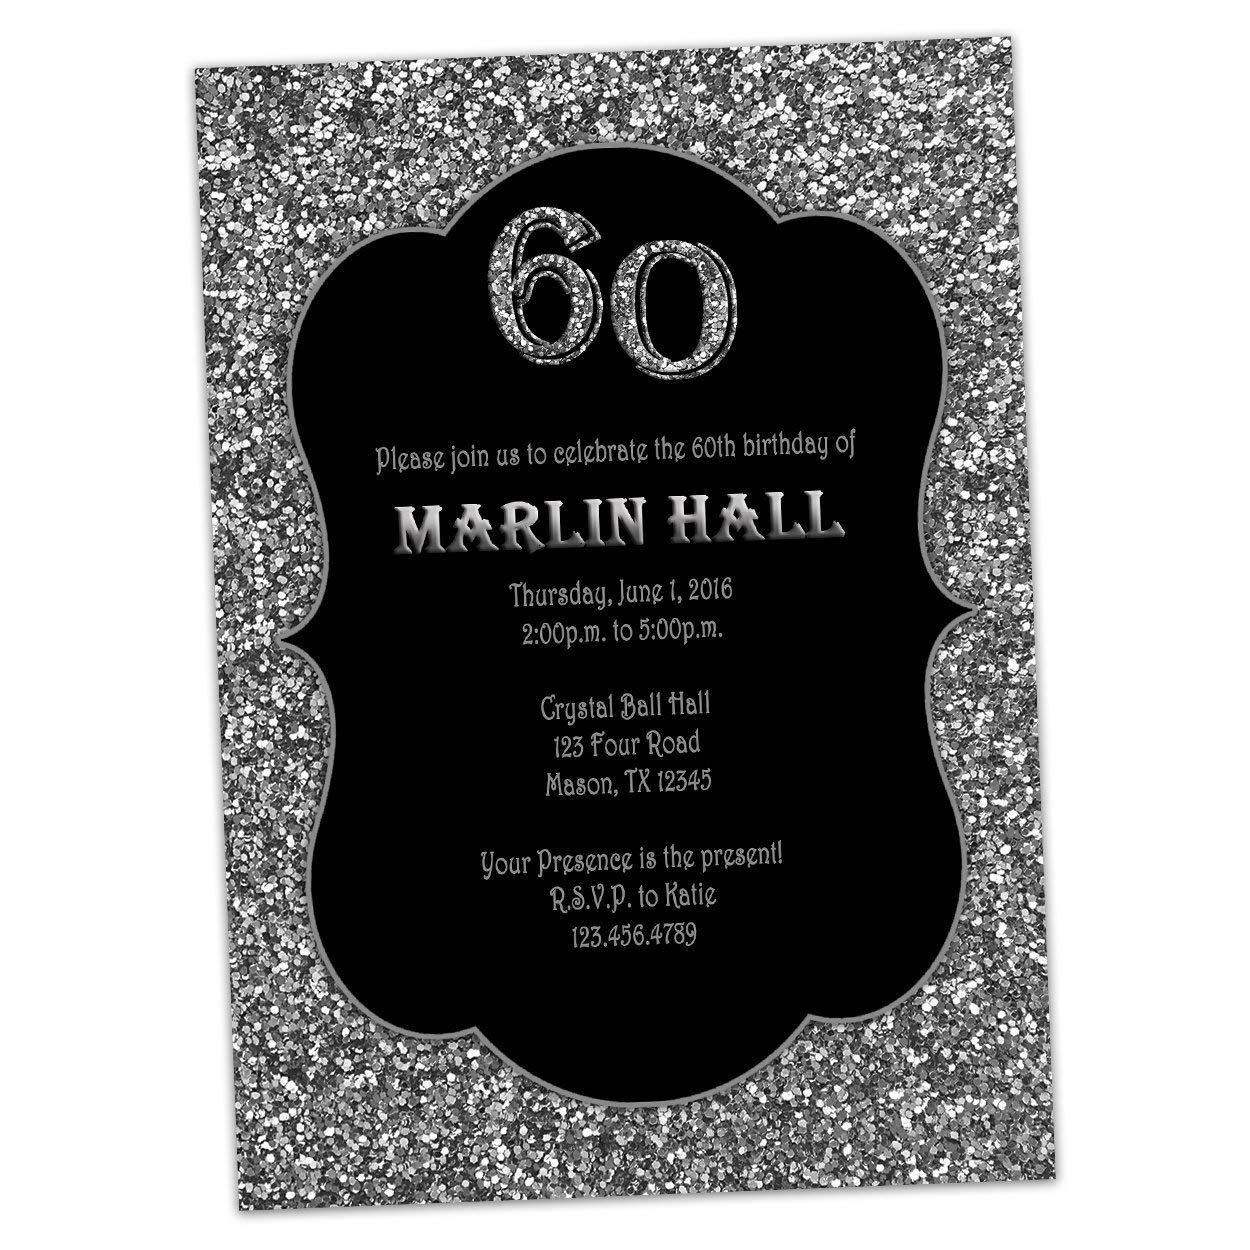 Amazon Silver Black Glitter Birthday Invitations Men Women 30th 40th 50th 60th 70th 80th Adult Handmade